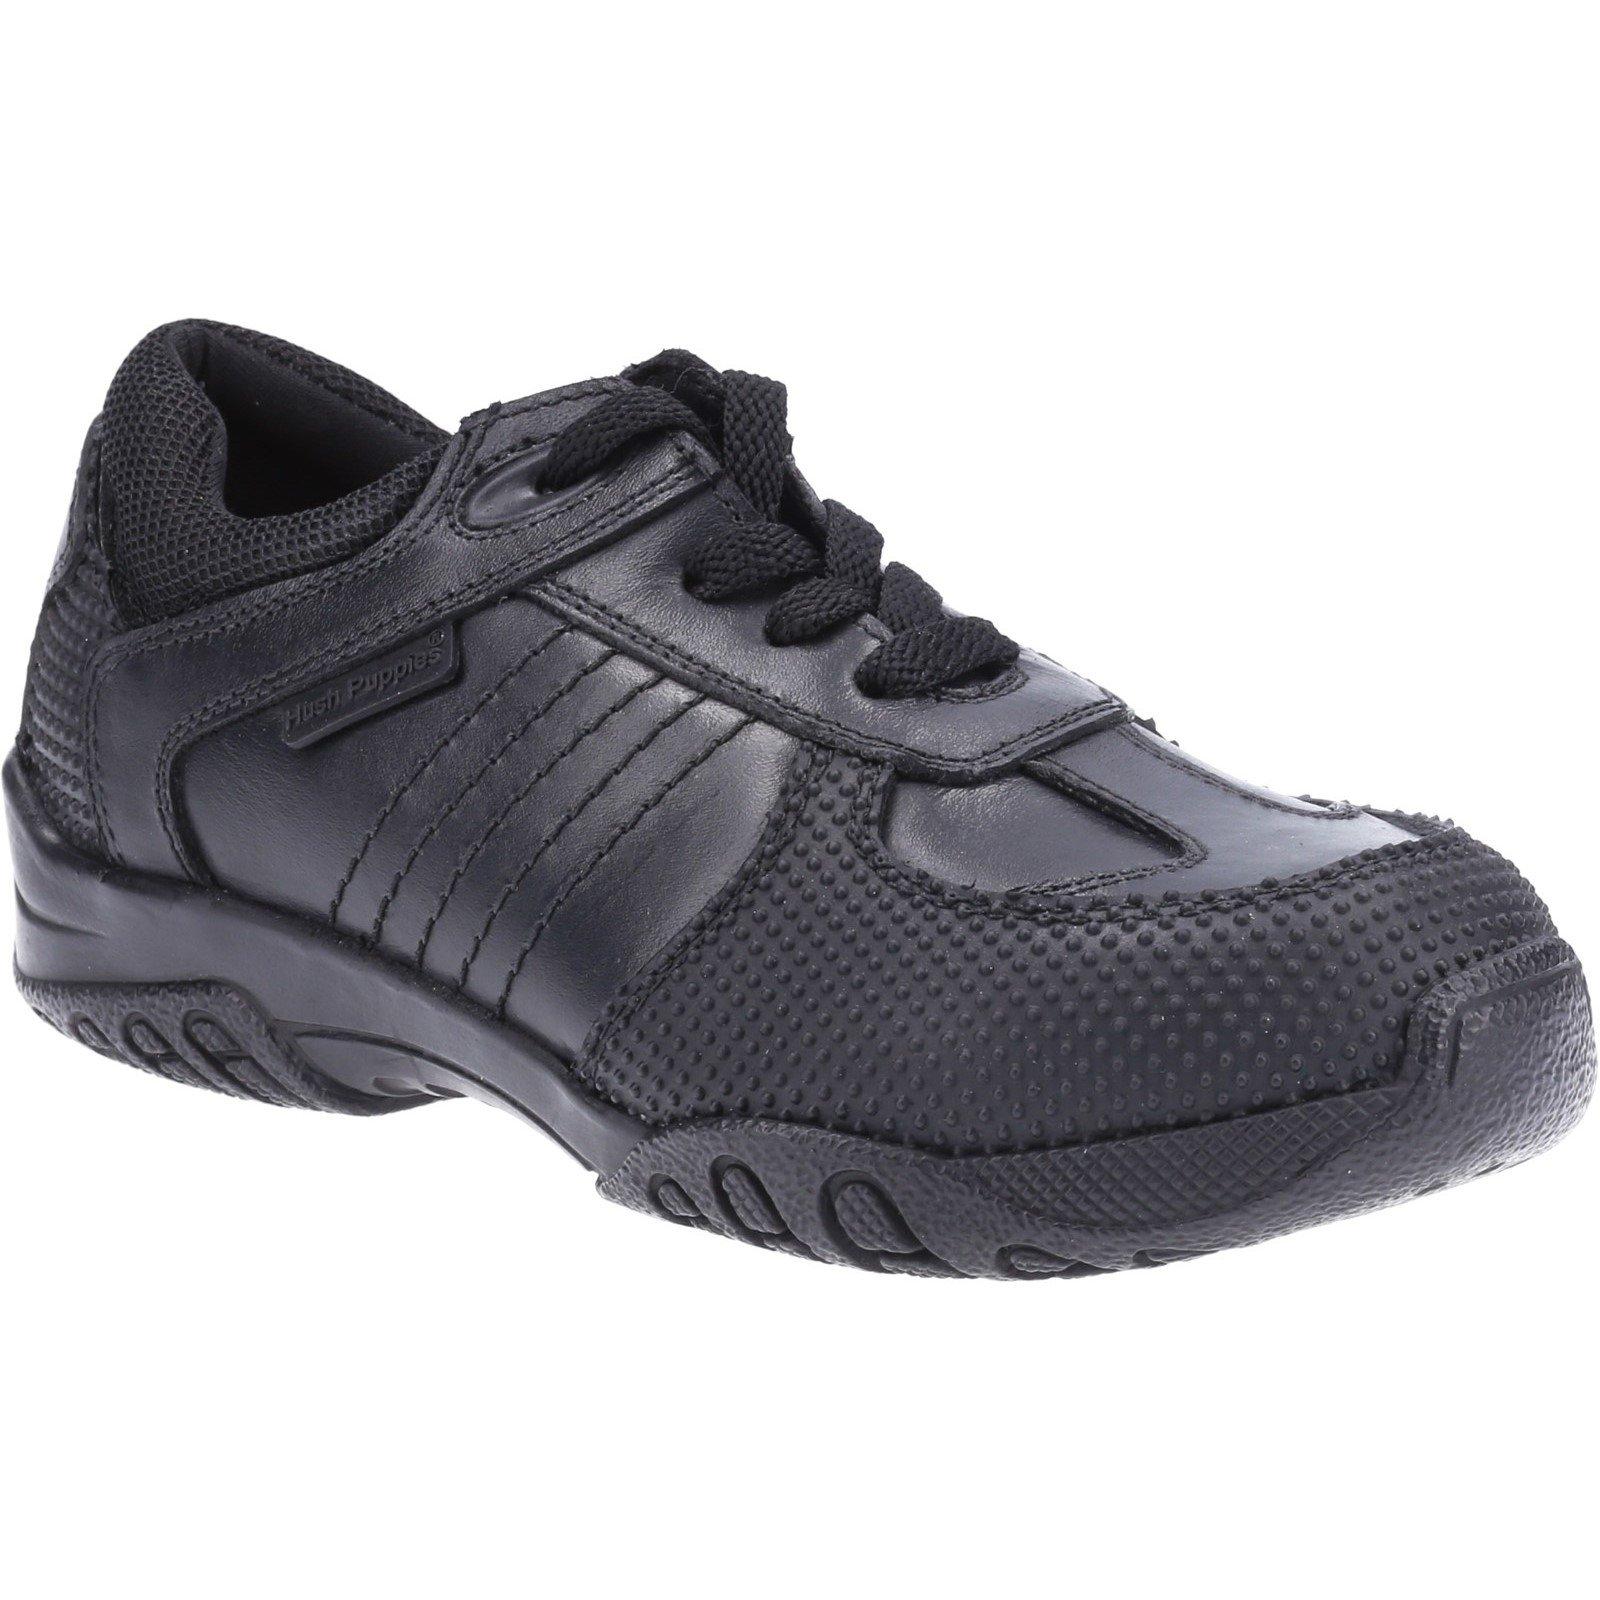 Hush Puppies Kid's Jezza Junior School Shoe Black 32587 - Black 2.5